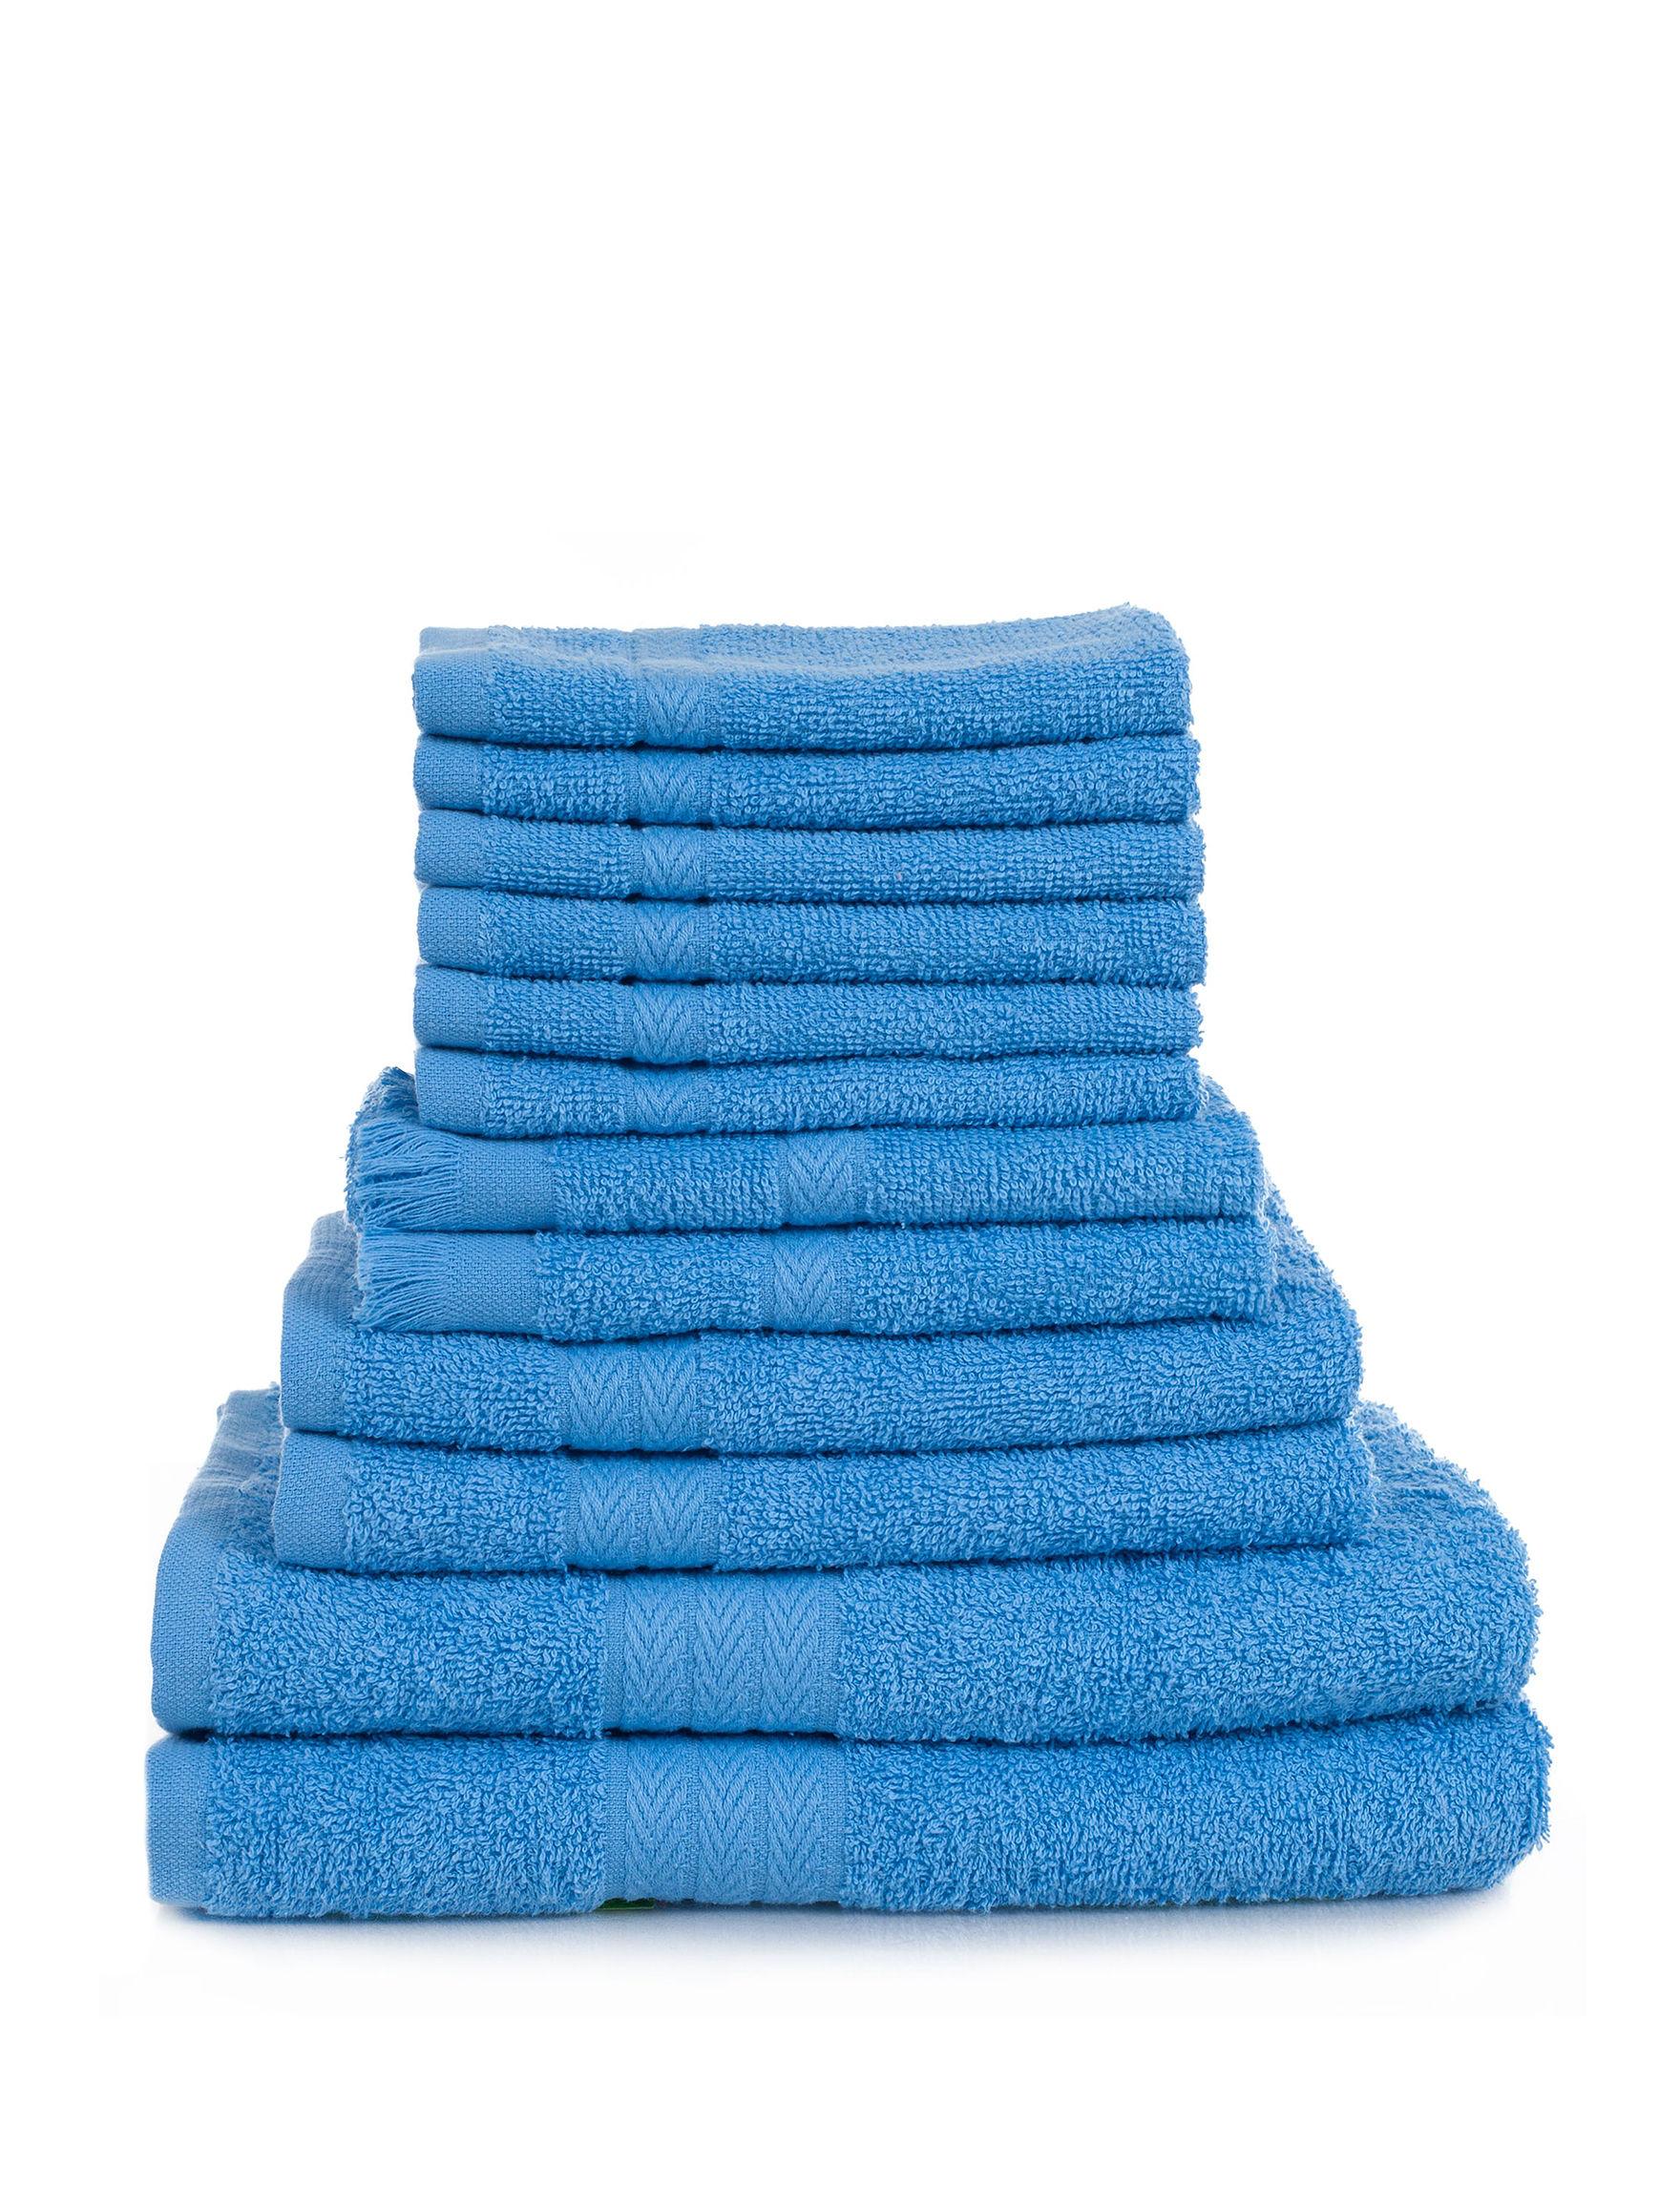 Lavish Home Blue Bath Towels Towel Sets Towels